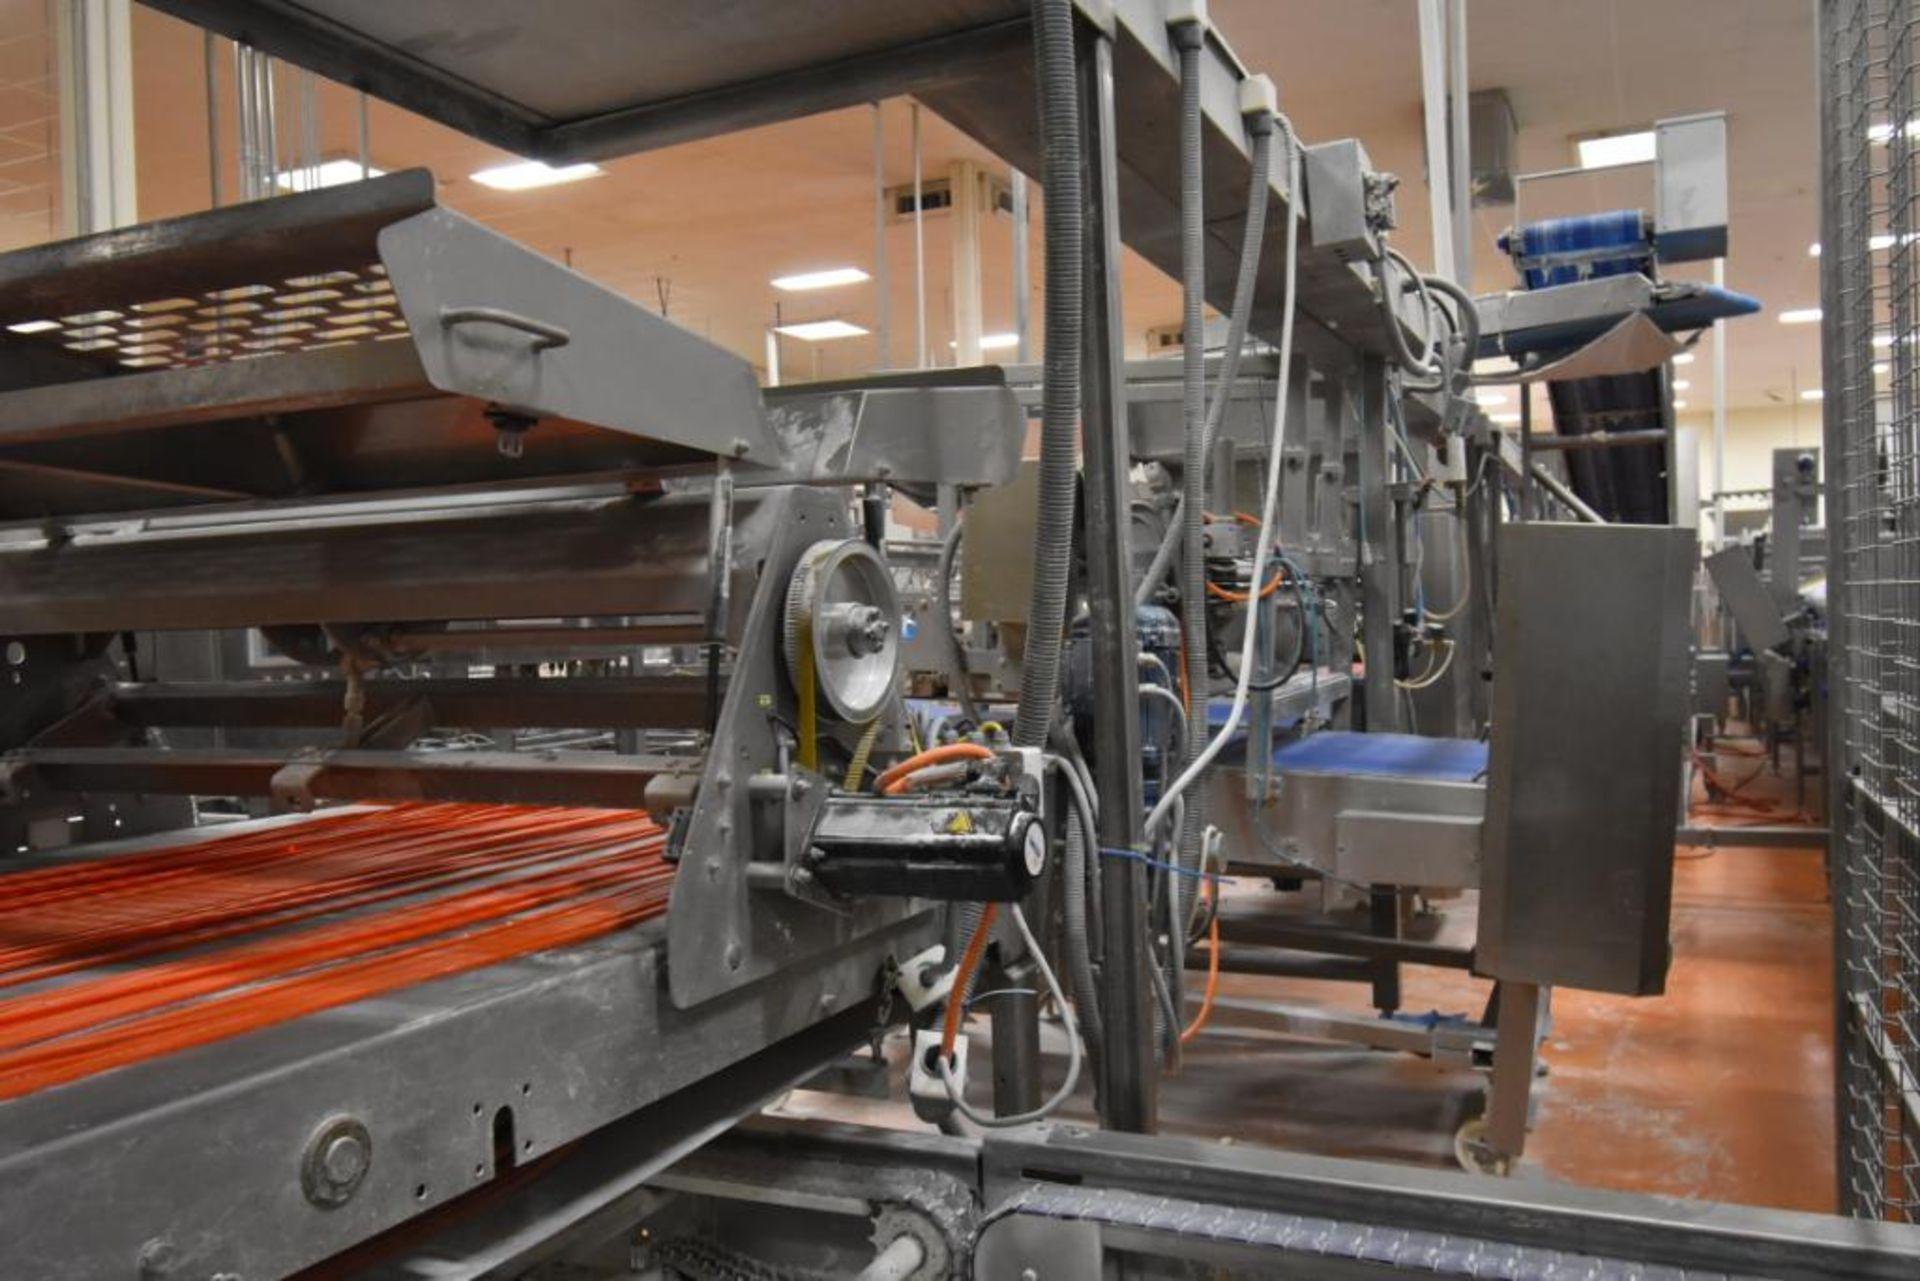 2007 Fritsch Laminator 3000 dough line - Image 228 of 280